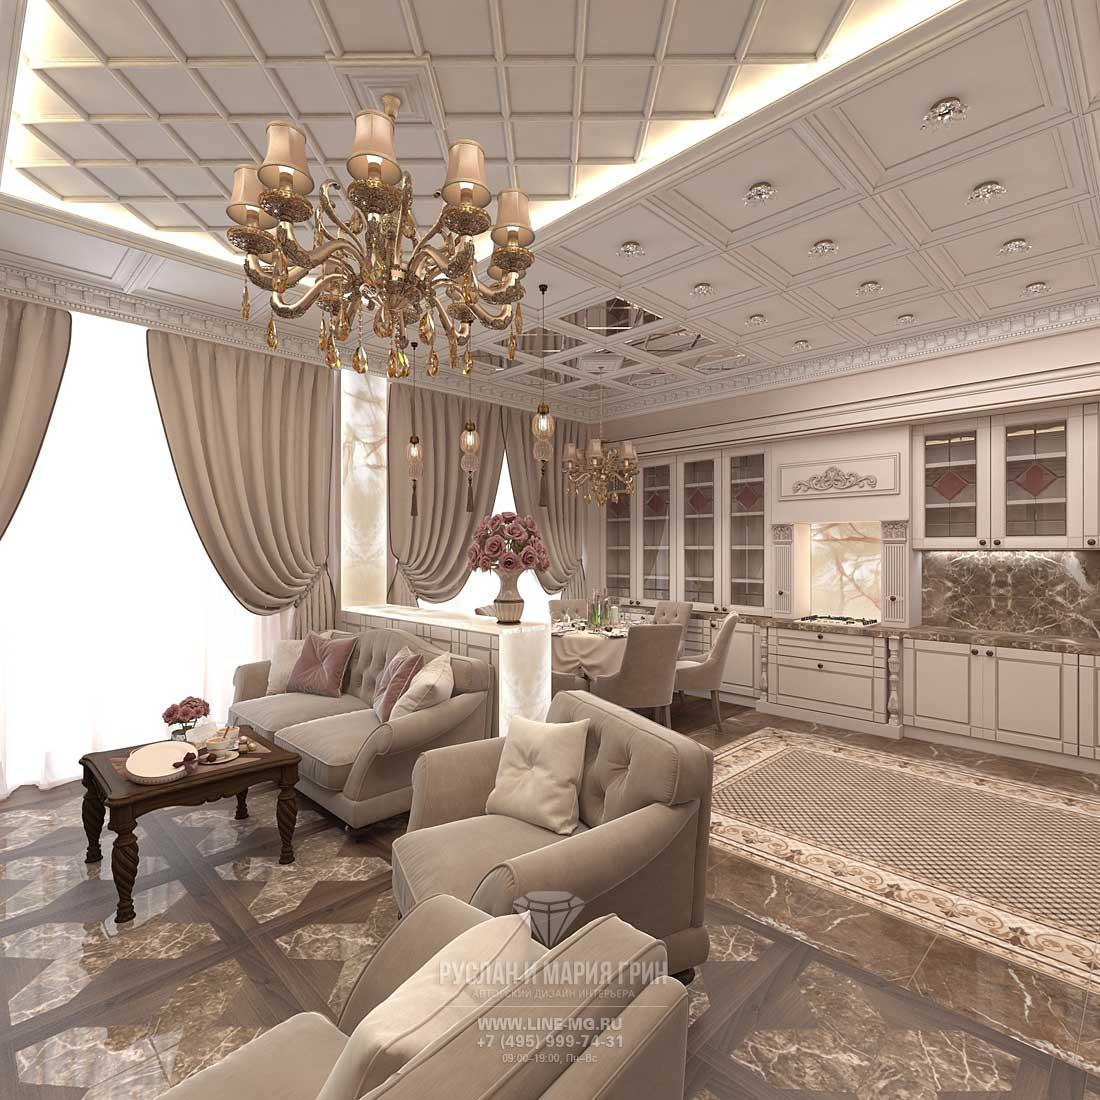 Дизайн кабинета руководителя, дизайн кабинетов – ЭОС